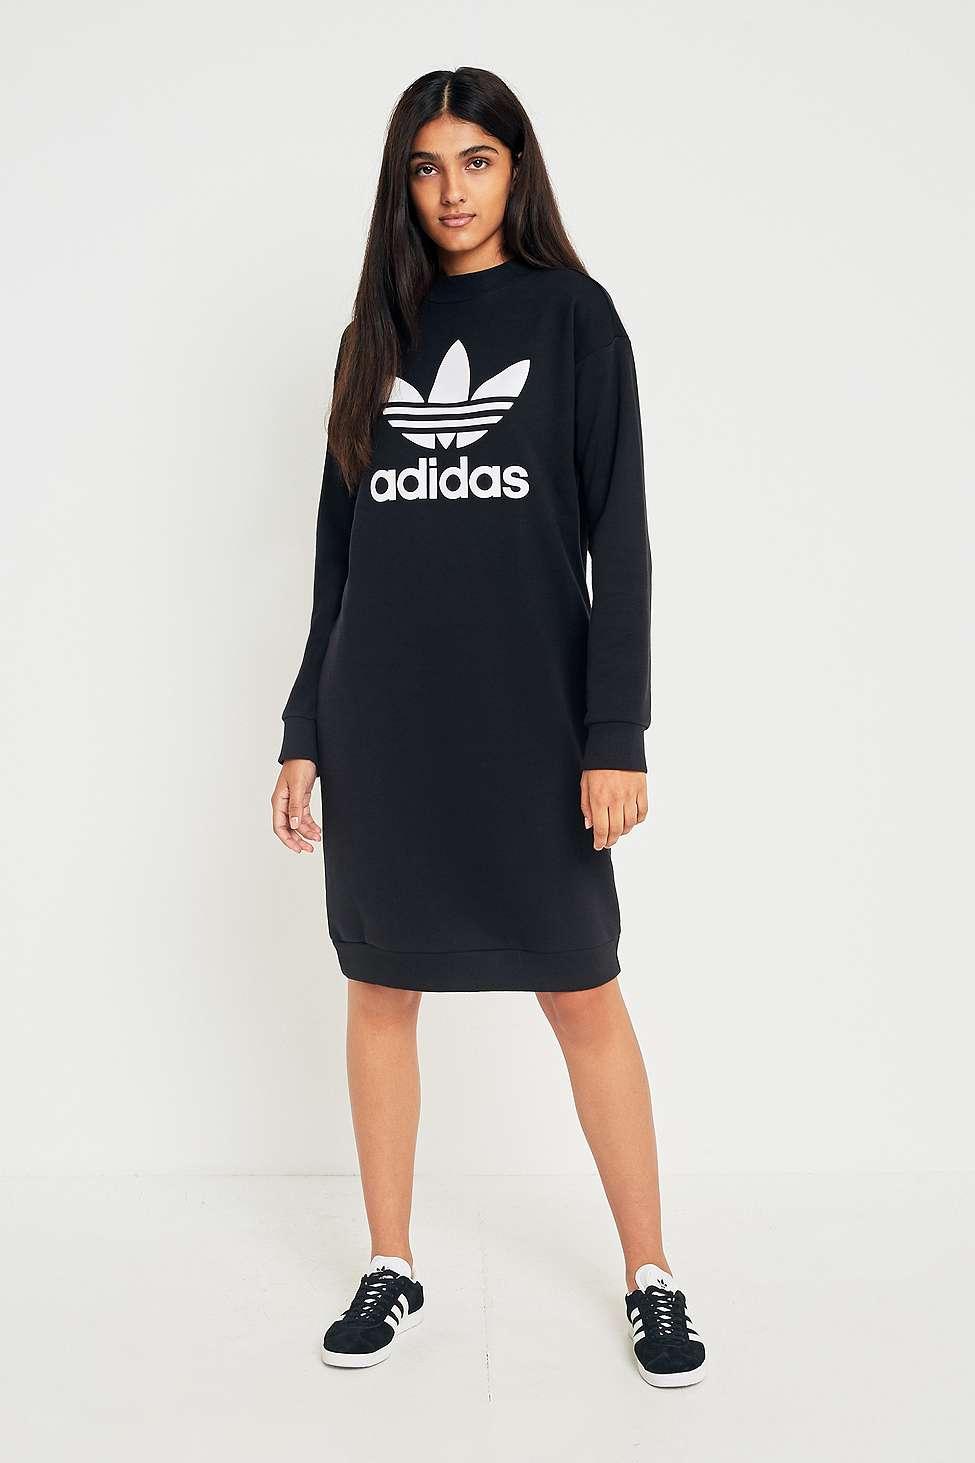 Adidas Originals Trefoil camiseta vestido Urban Outfitters